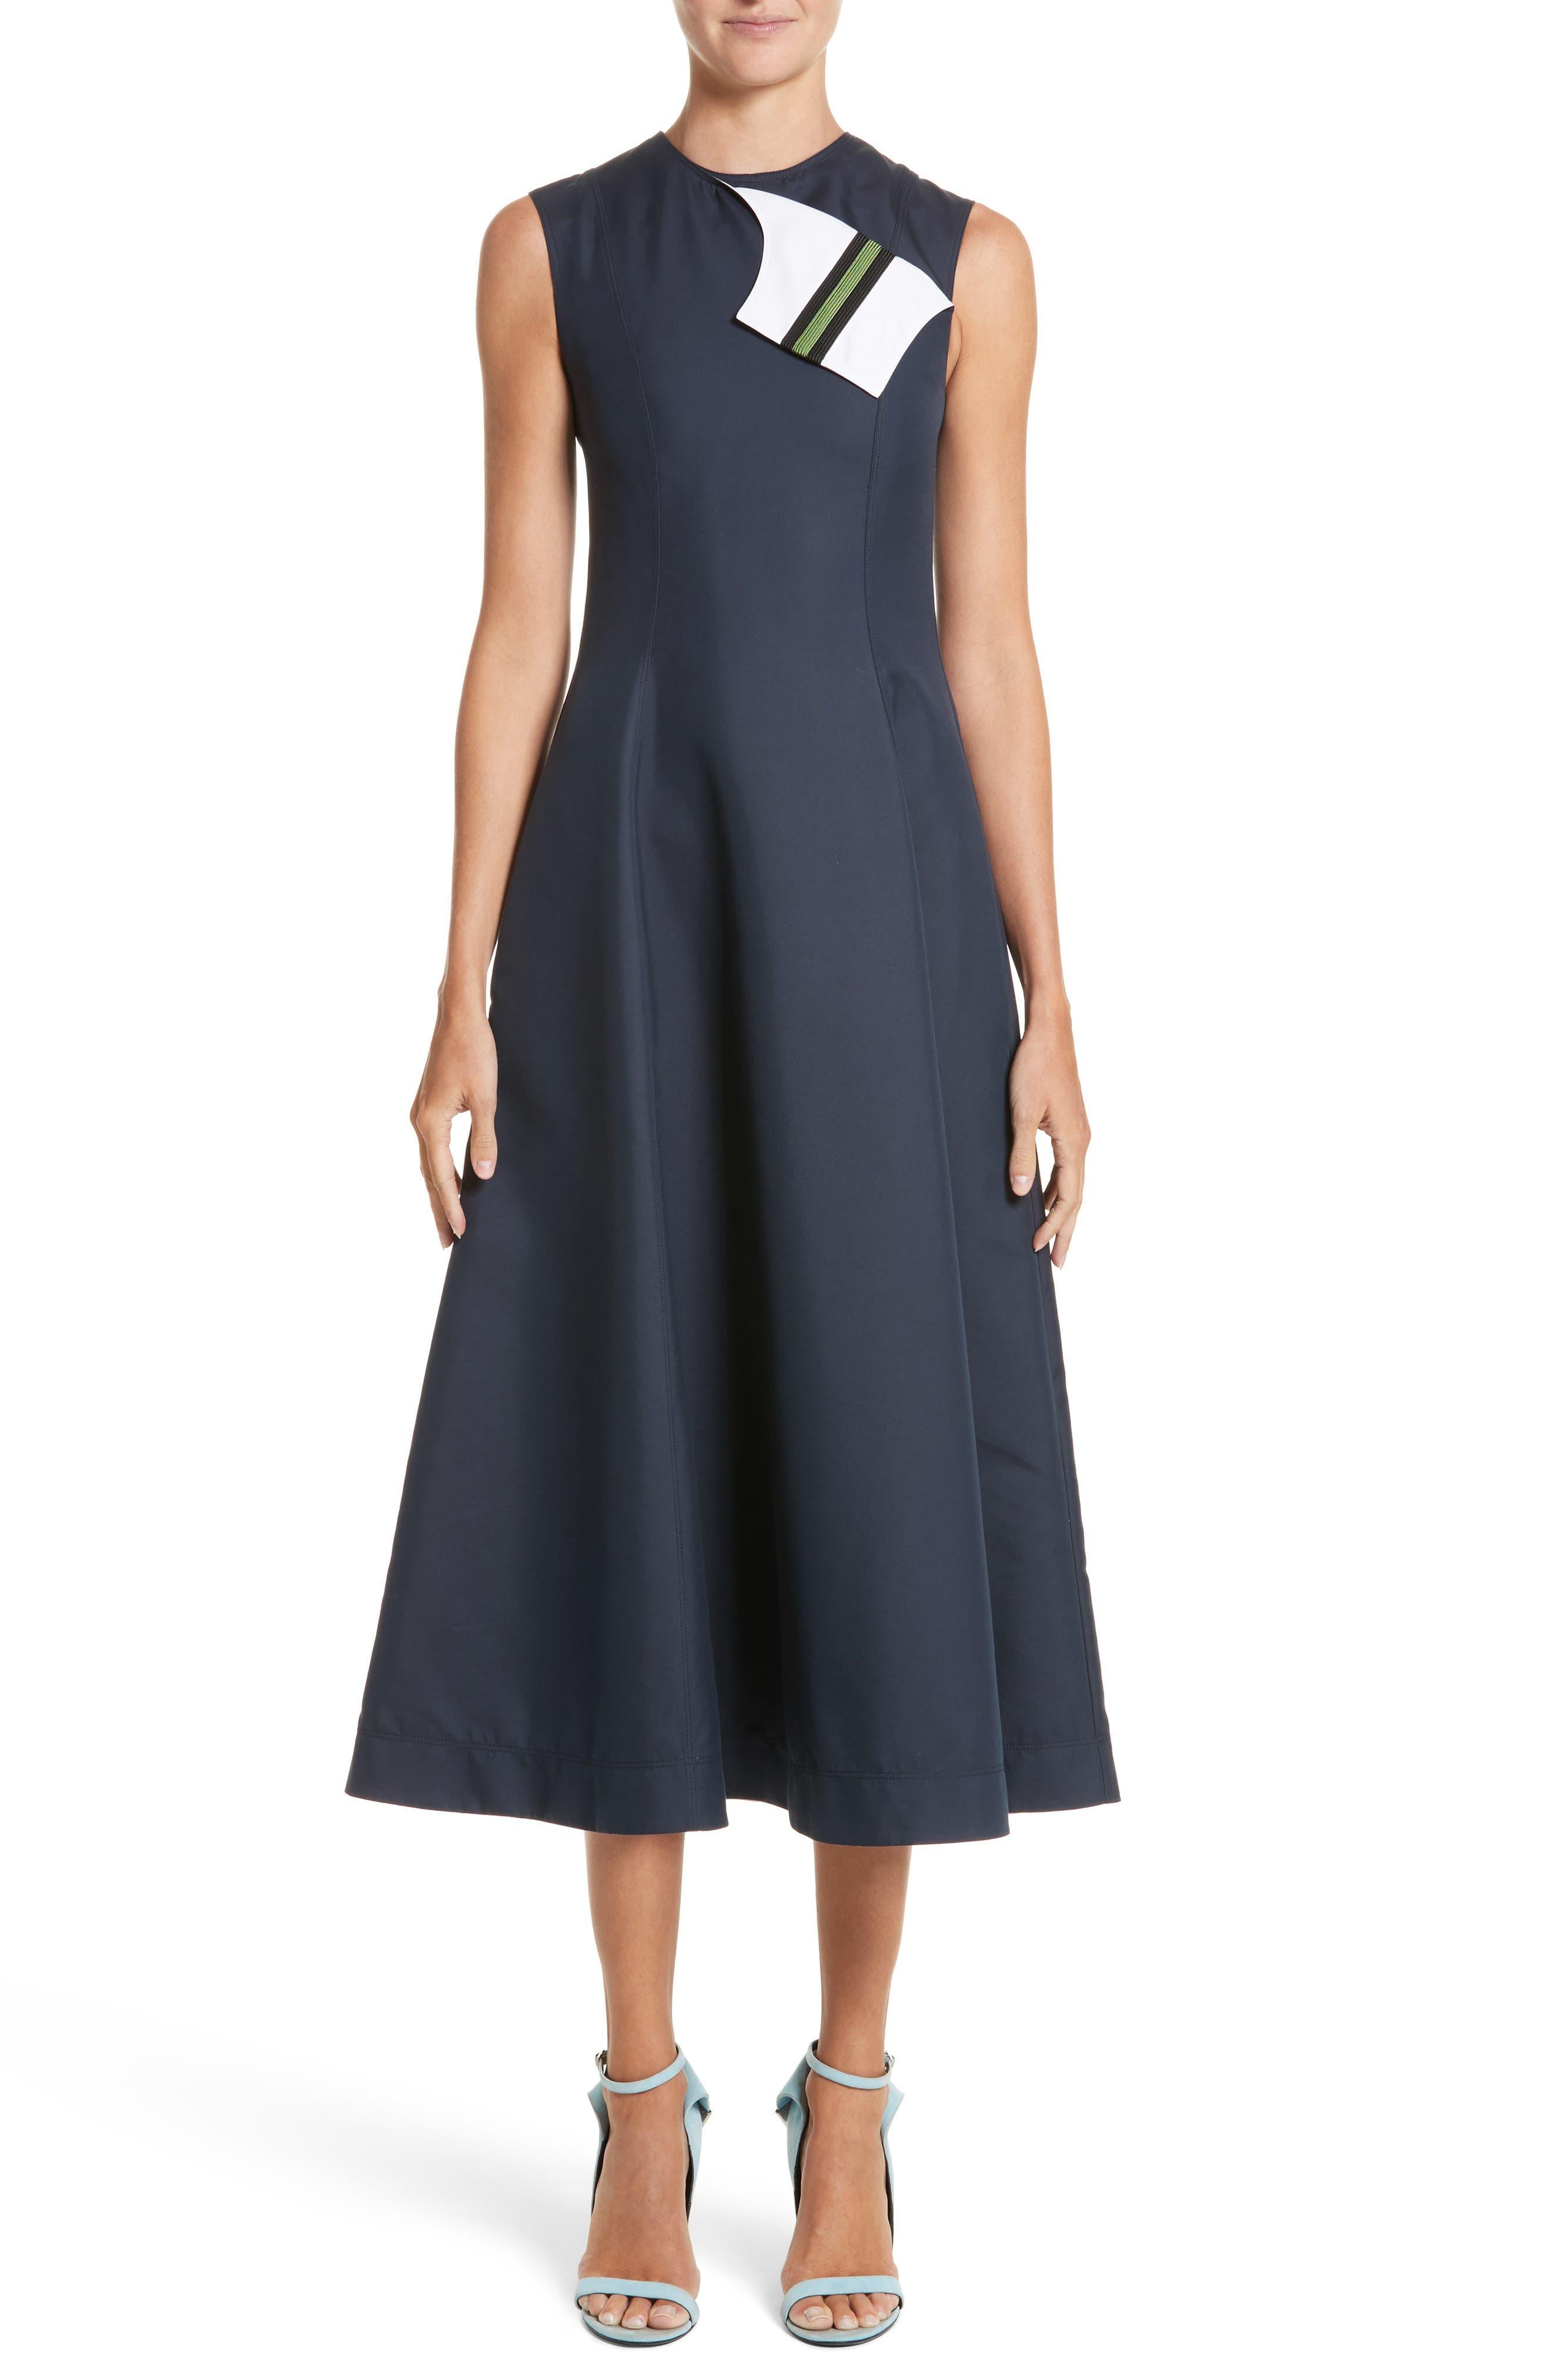 Alternate Image 1 Selected - Calvin Klein 205W39NYC Cotton & Silk Dress